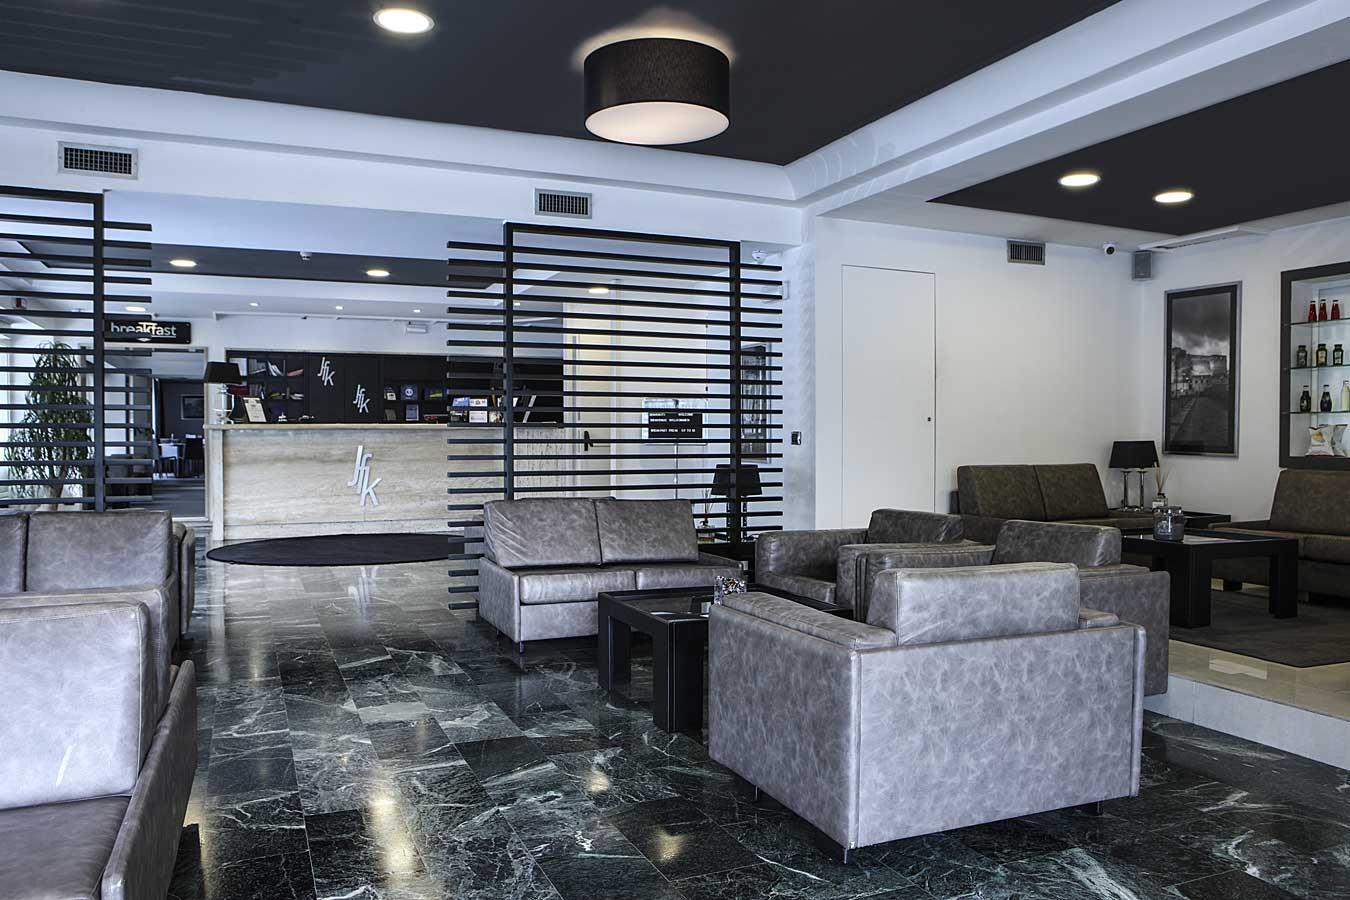 Best Western Jfk Hotel Napoli Napoli Na